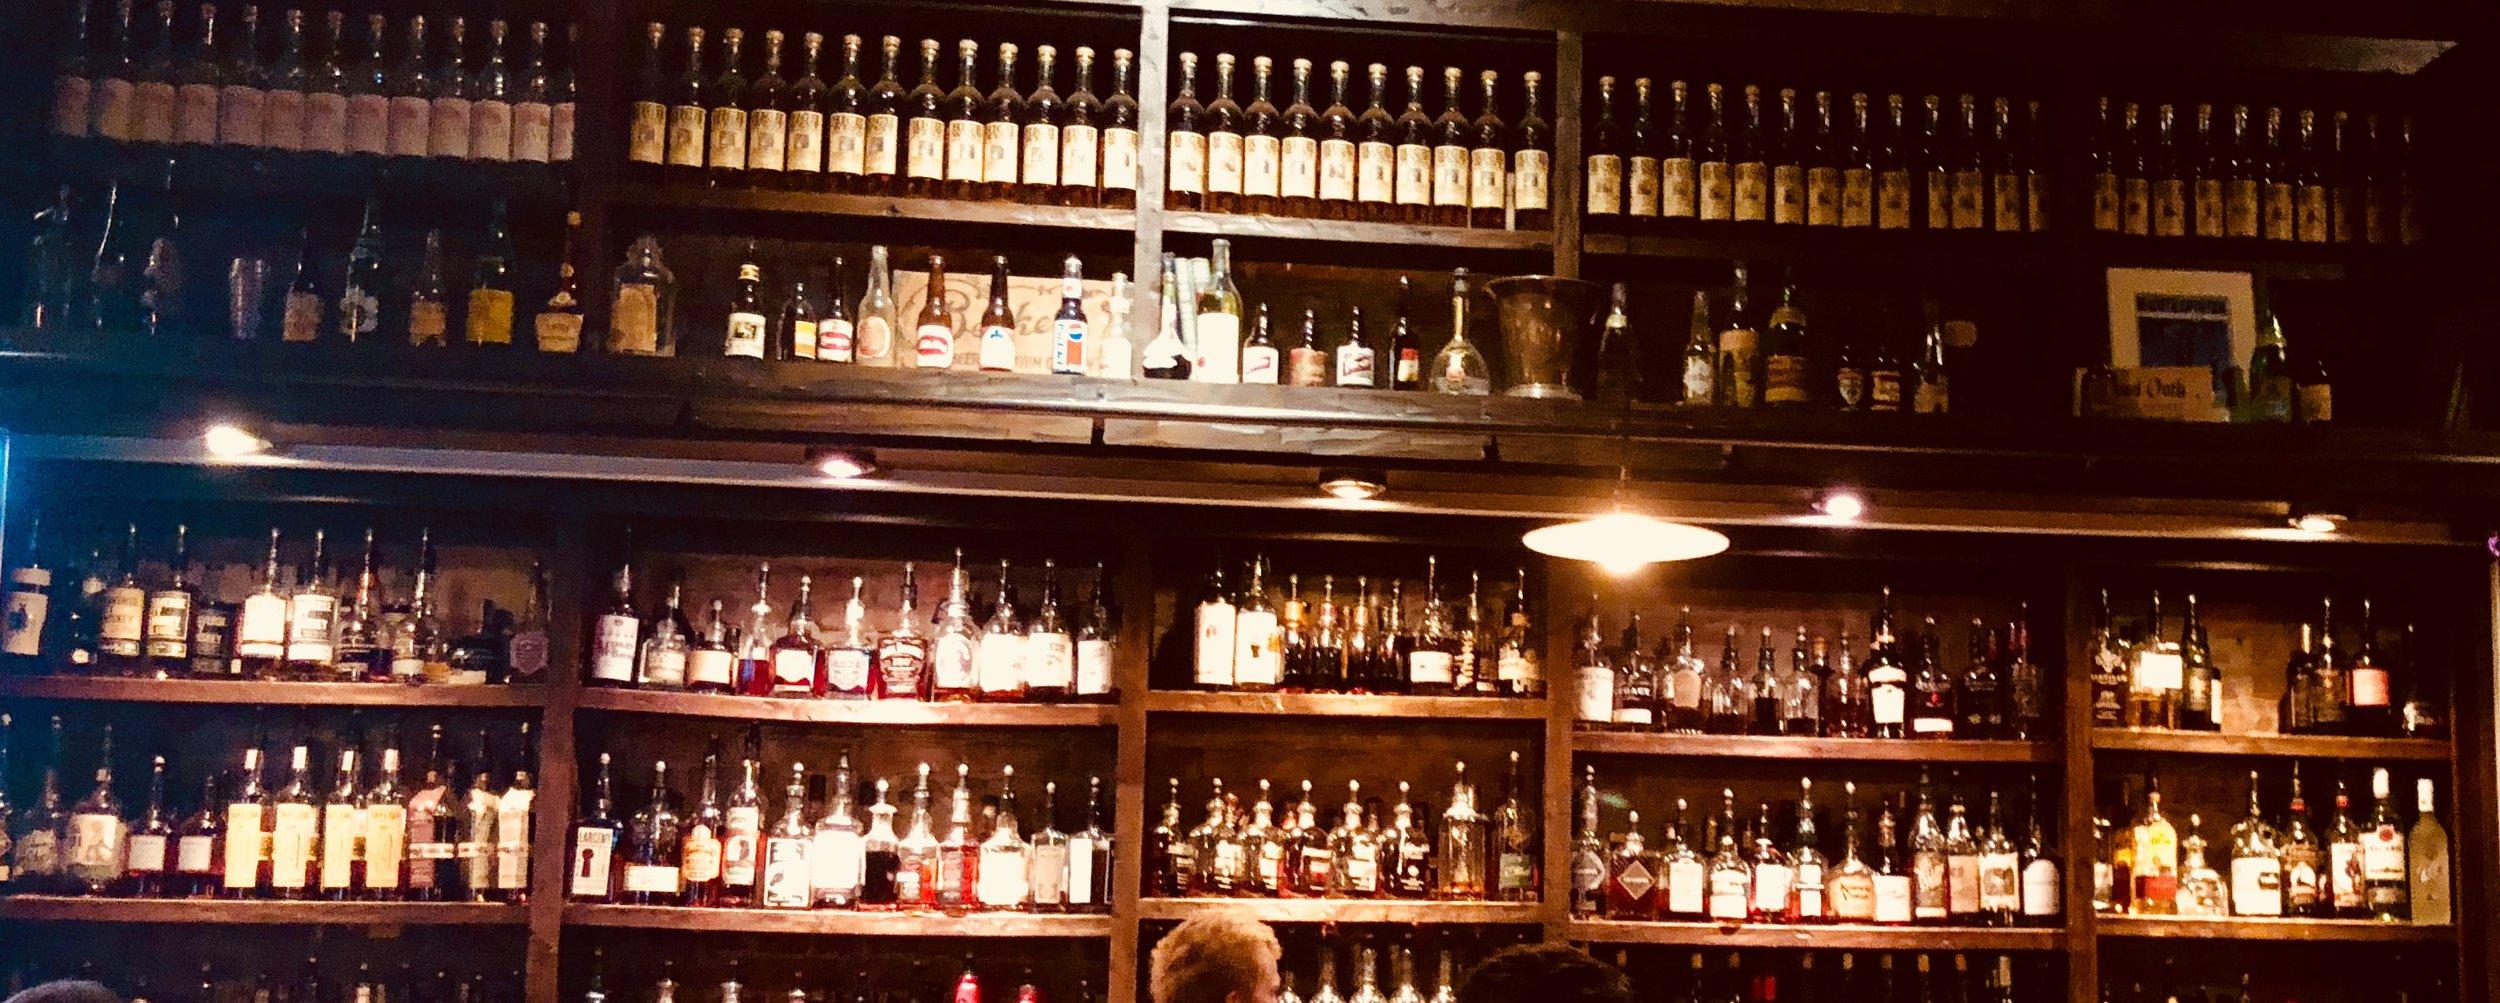 Whiskey Street in Salt Lake City